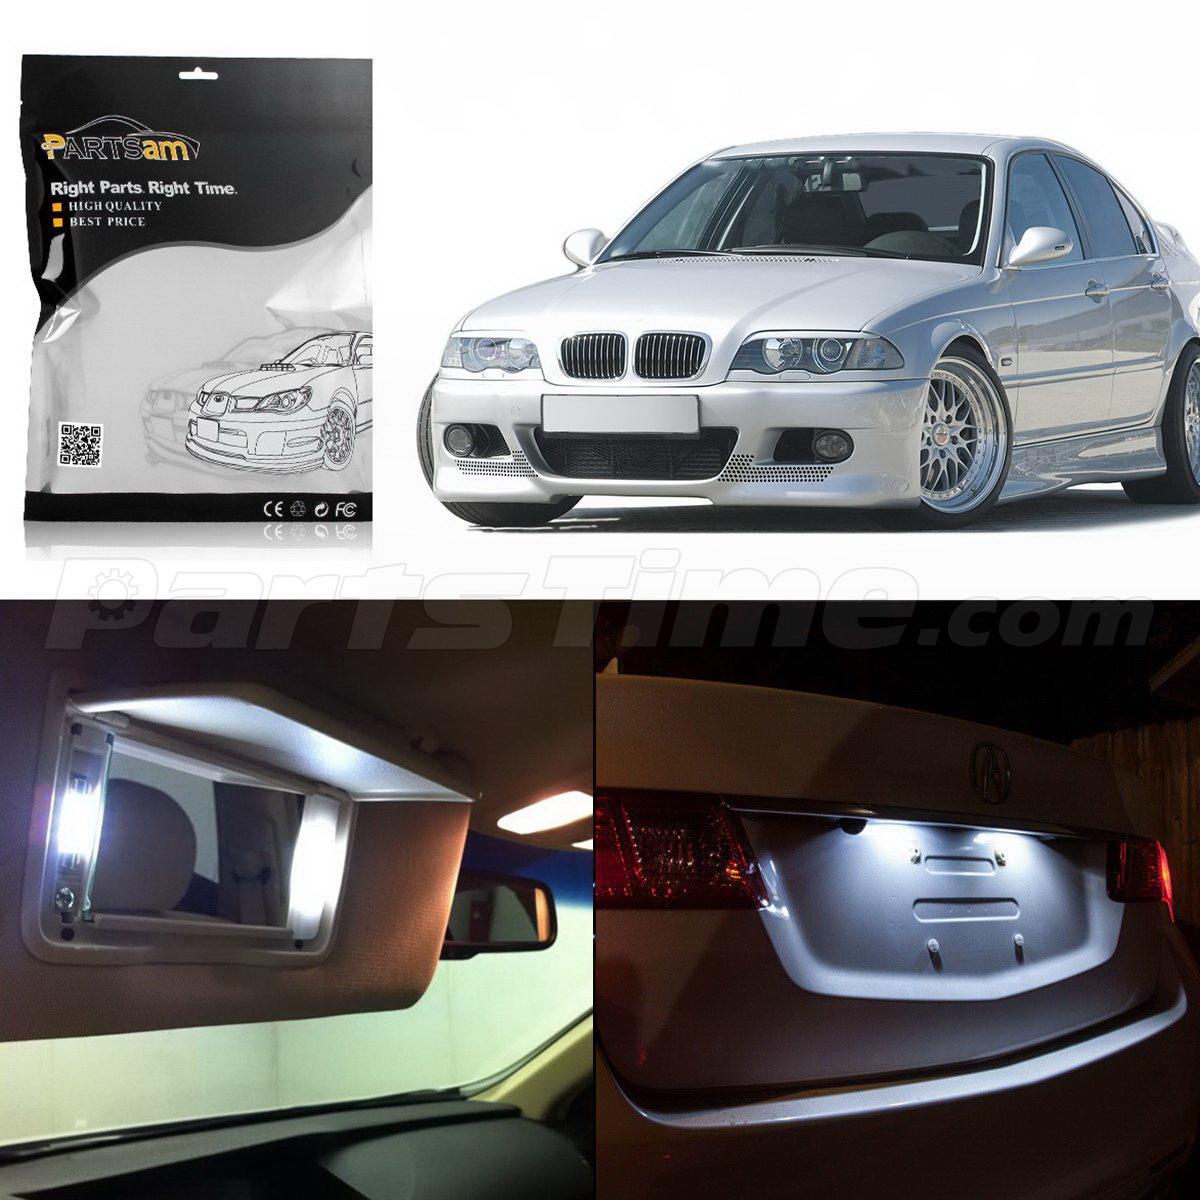 Bmw Xi 2006: 16 White Interior LED Light Package Full Set Lamp For BMW